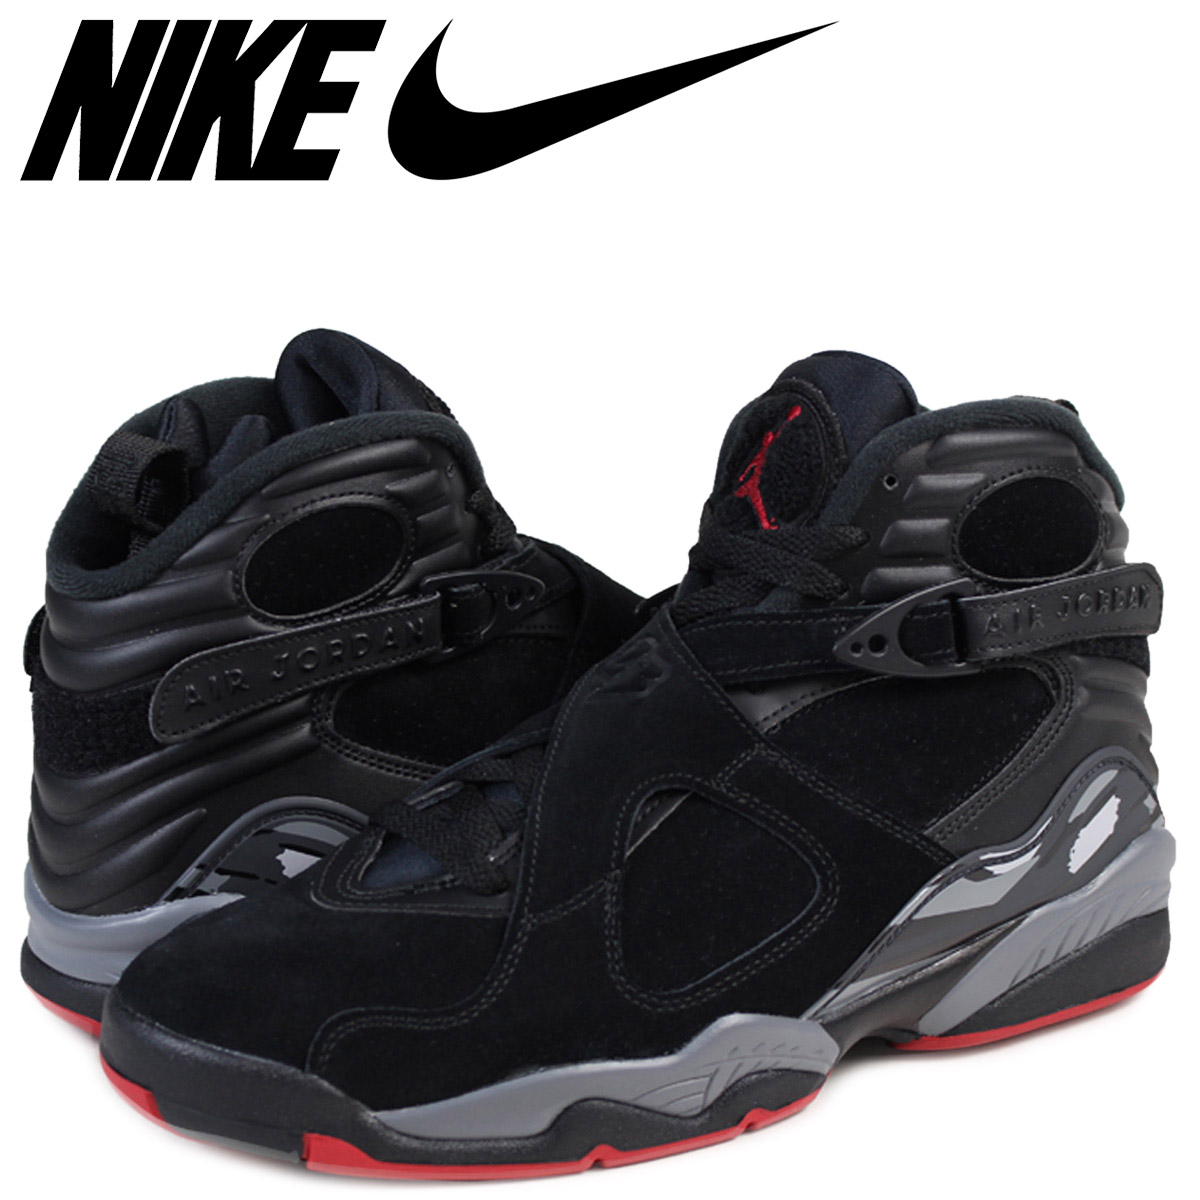 a110bb70201e SneaK Online Shop  Nike NIKE Air Jordan 8 nostalgic sneakers AIR ...